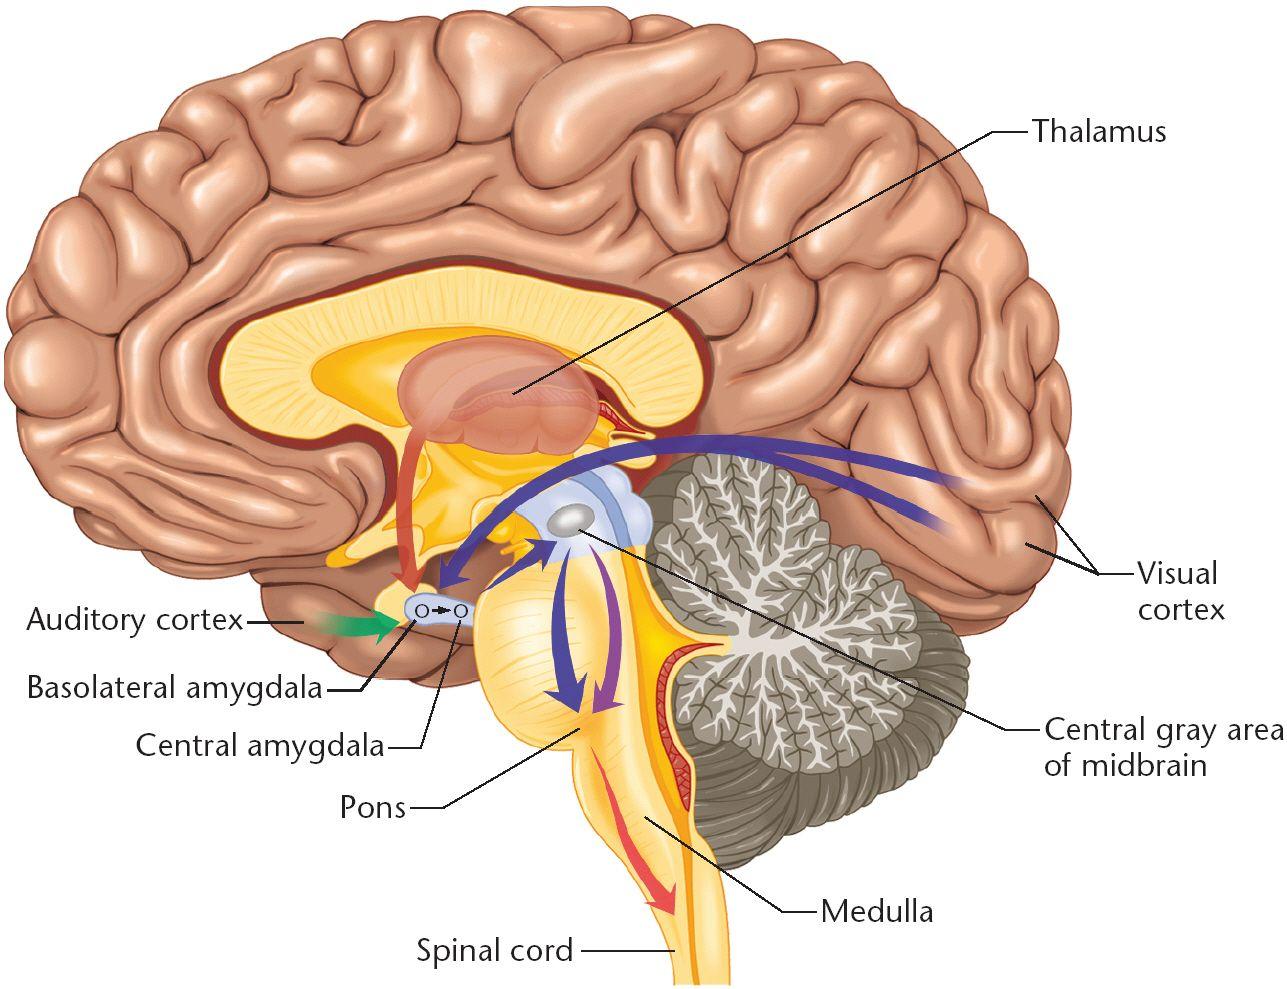 All Parts Of Inside Brain Unlabeled Diagram Brain Diagram